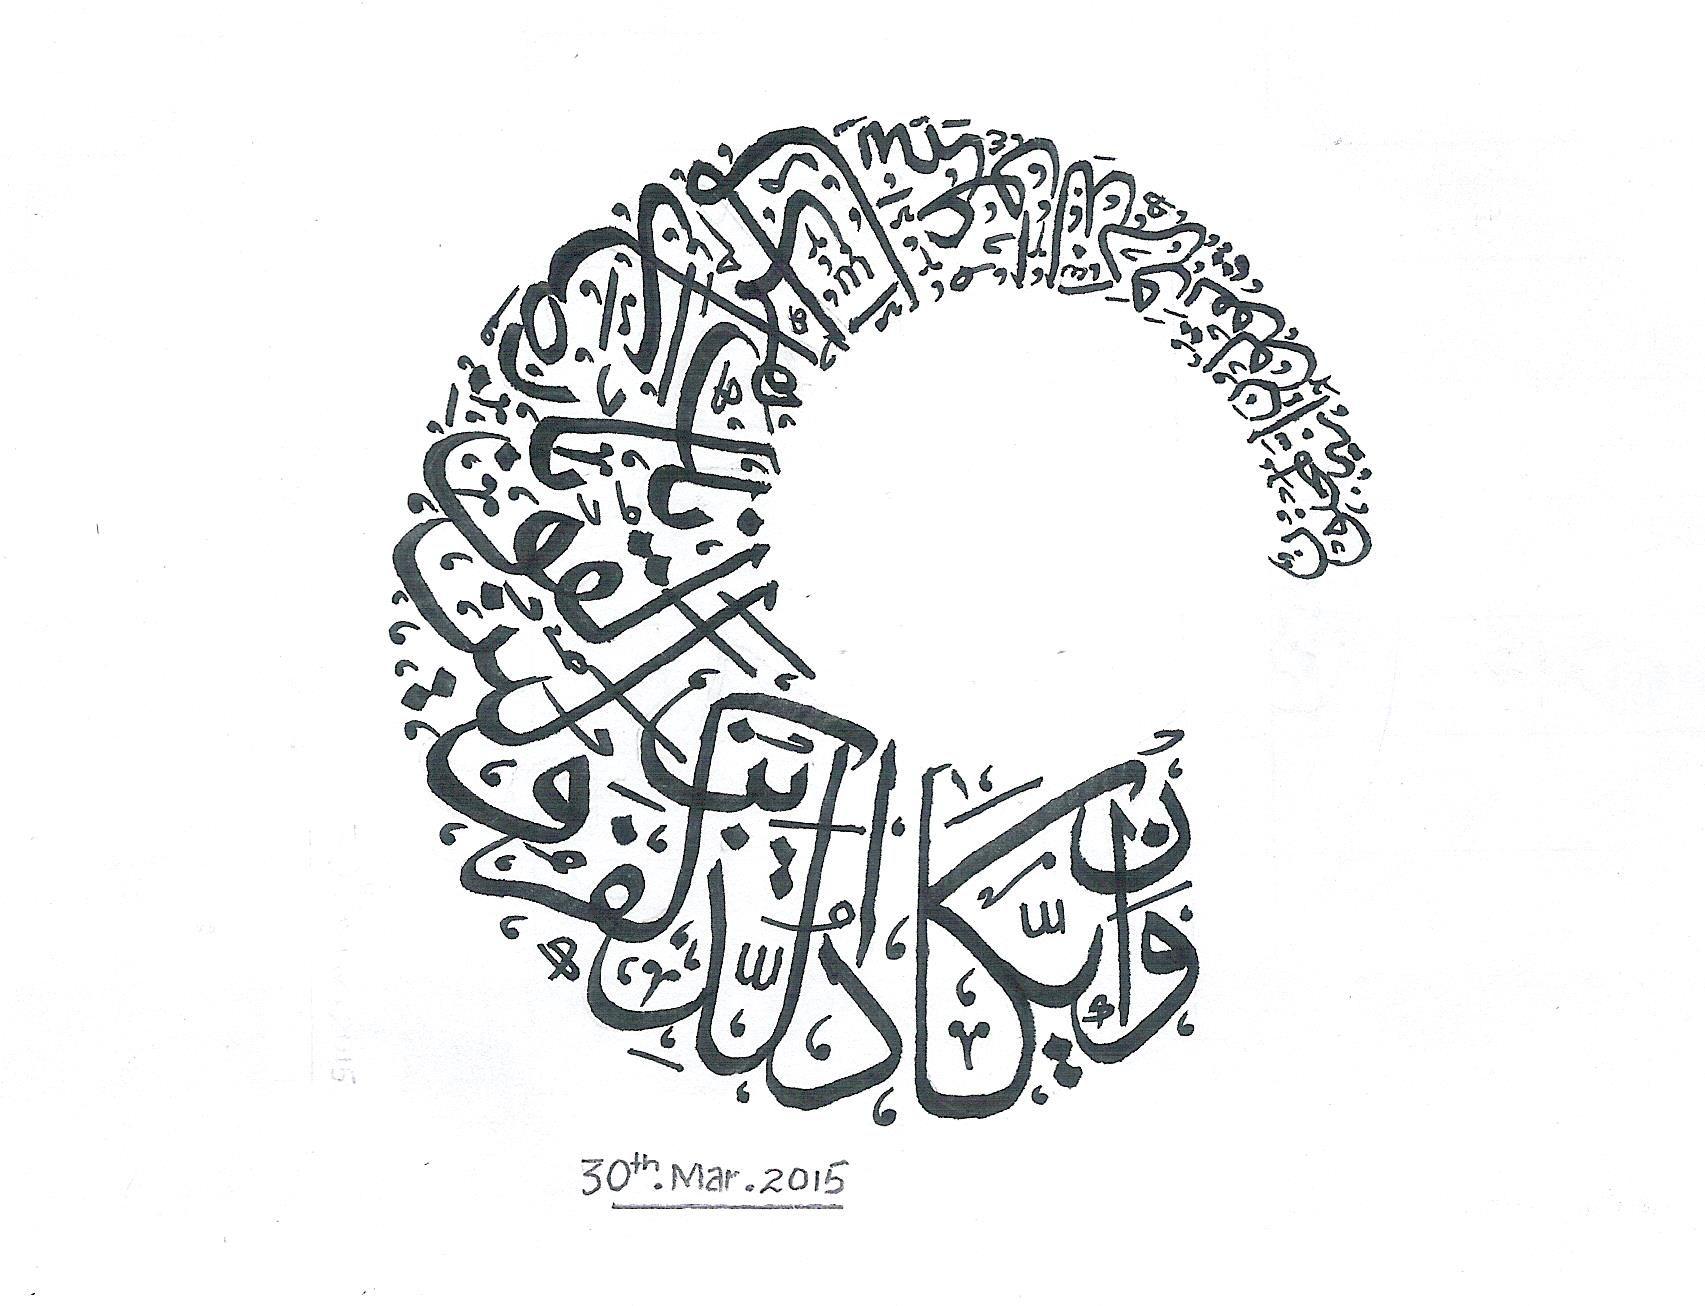 Suraqalam51 Jpg 1705 1306 Canvas Art Graphic Design Art